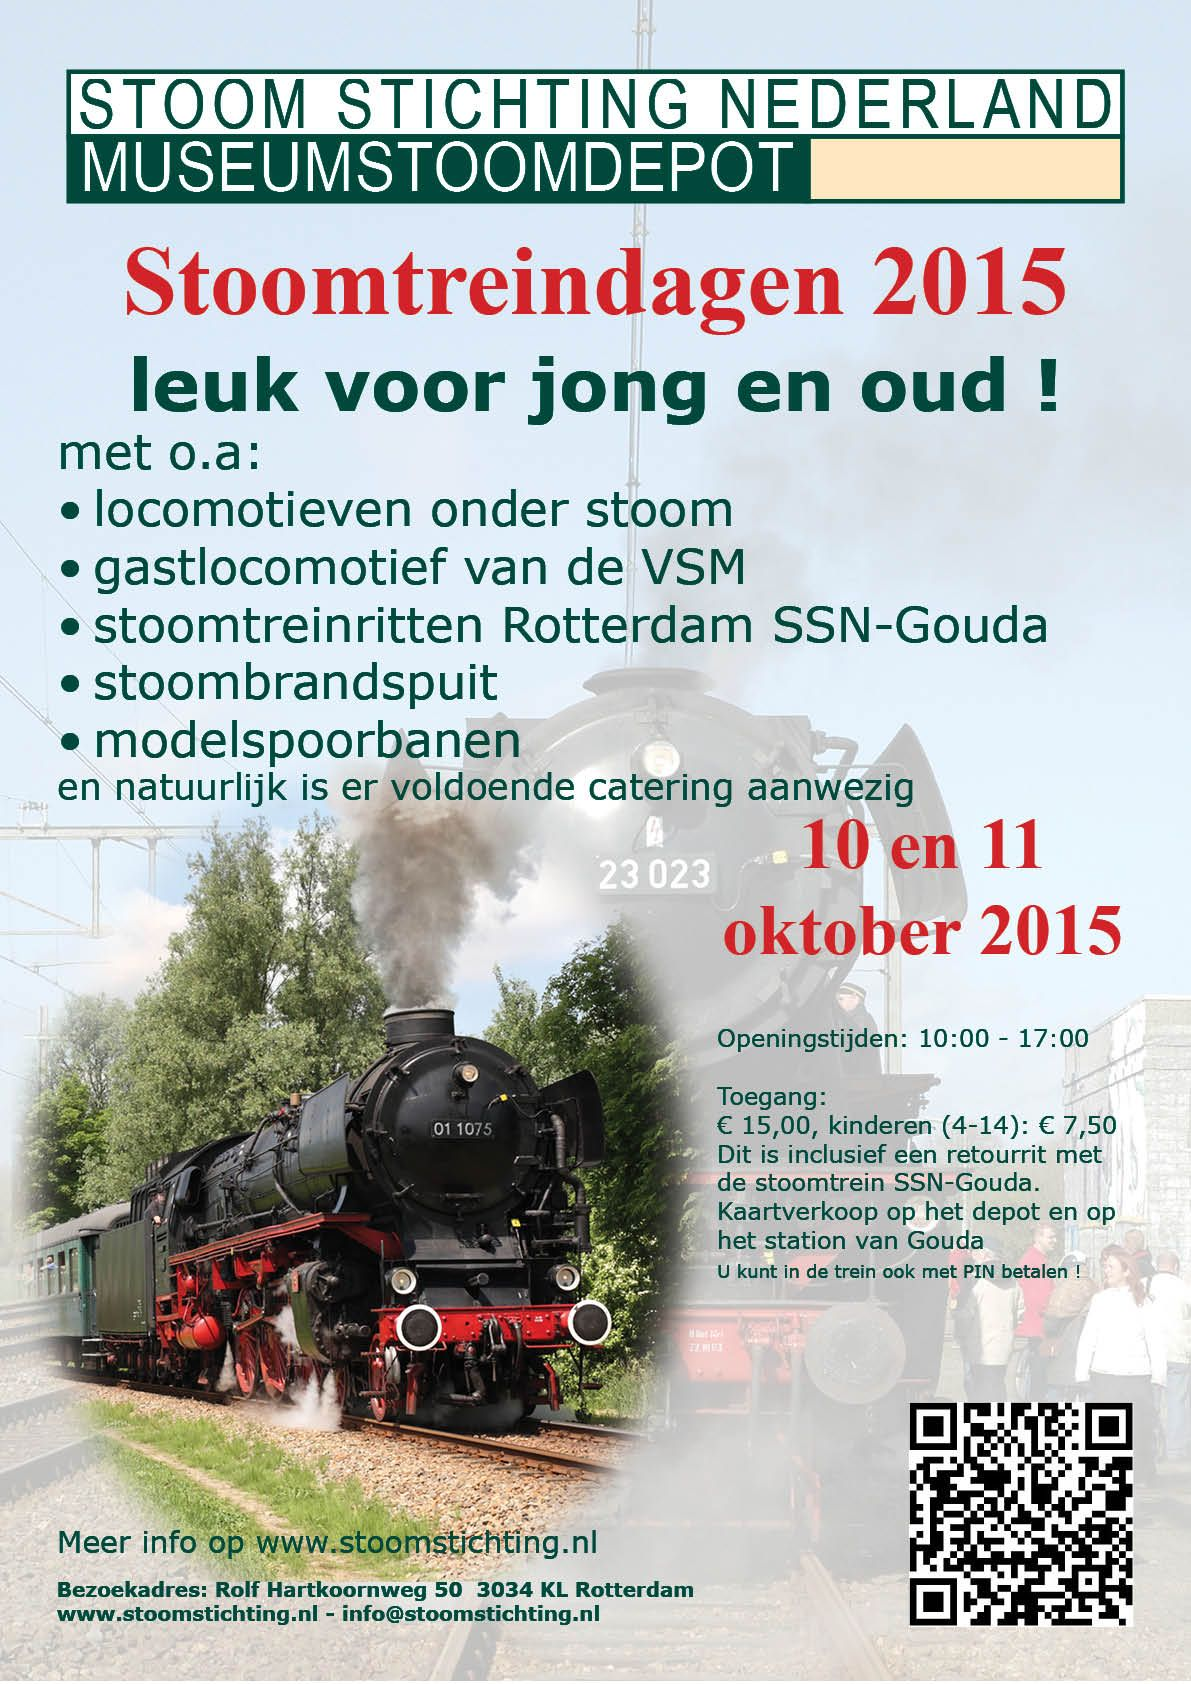 Stoom Stichting Nederland - Evenementen en ritten